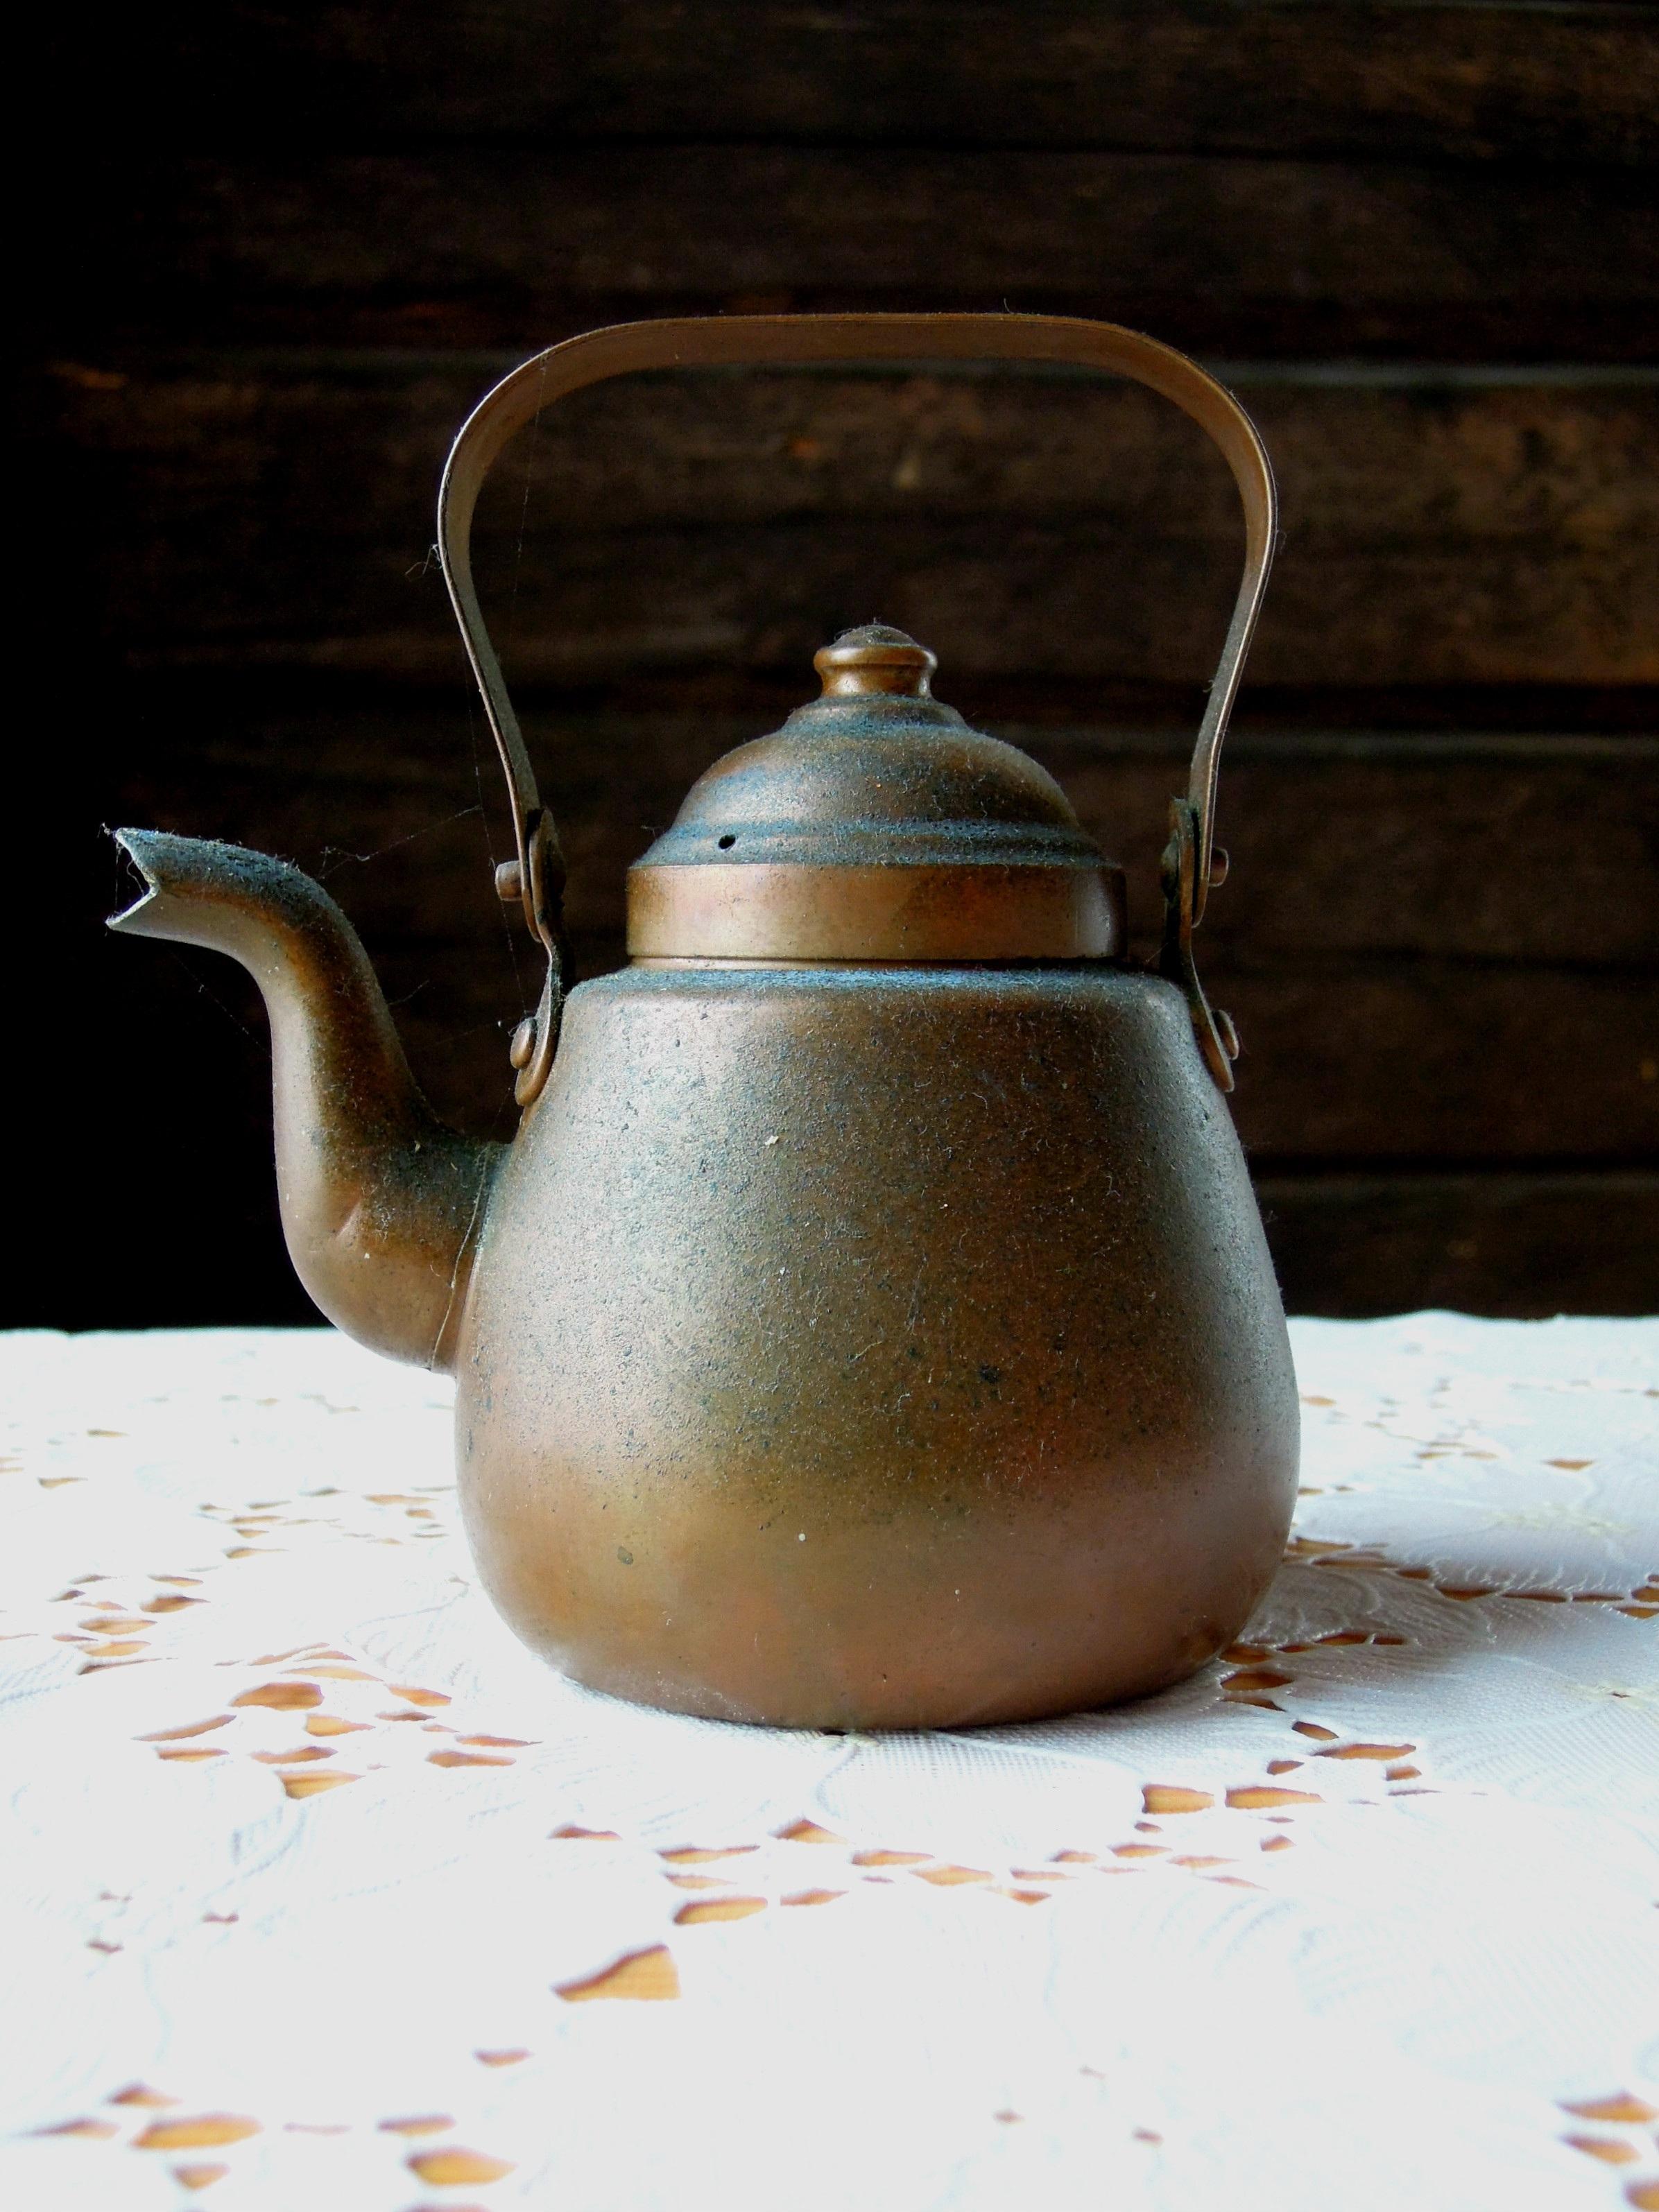 эволюция чайника в фото каждого убитого